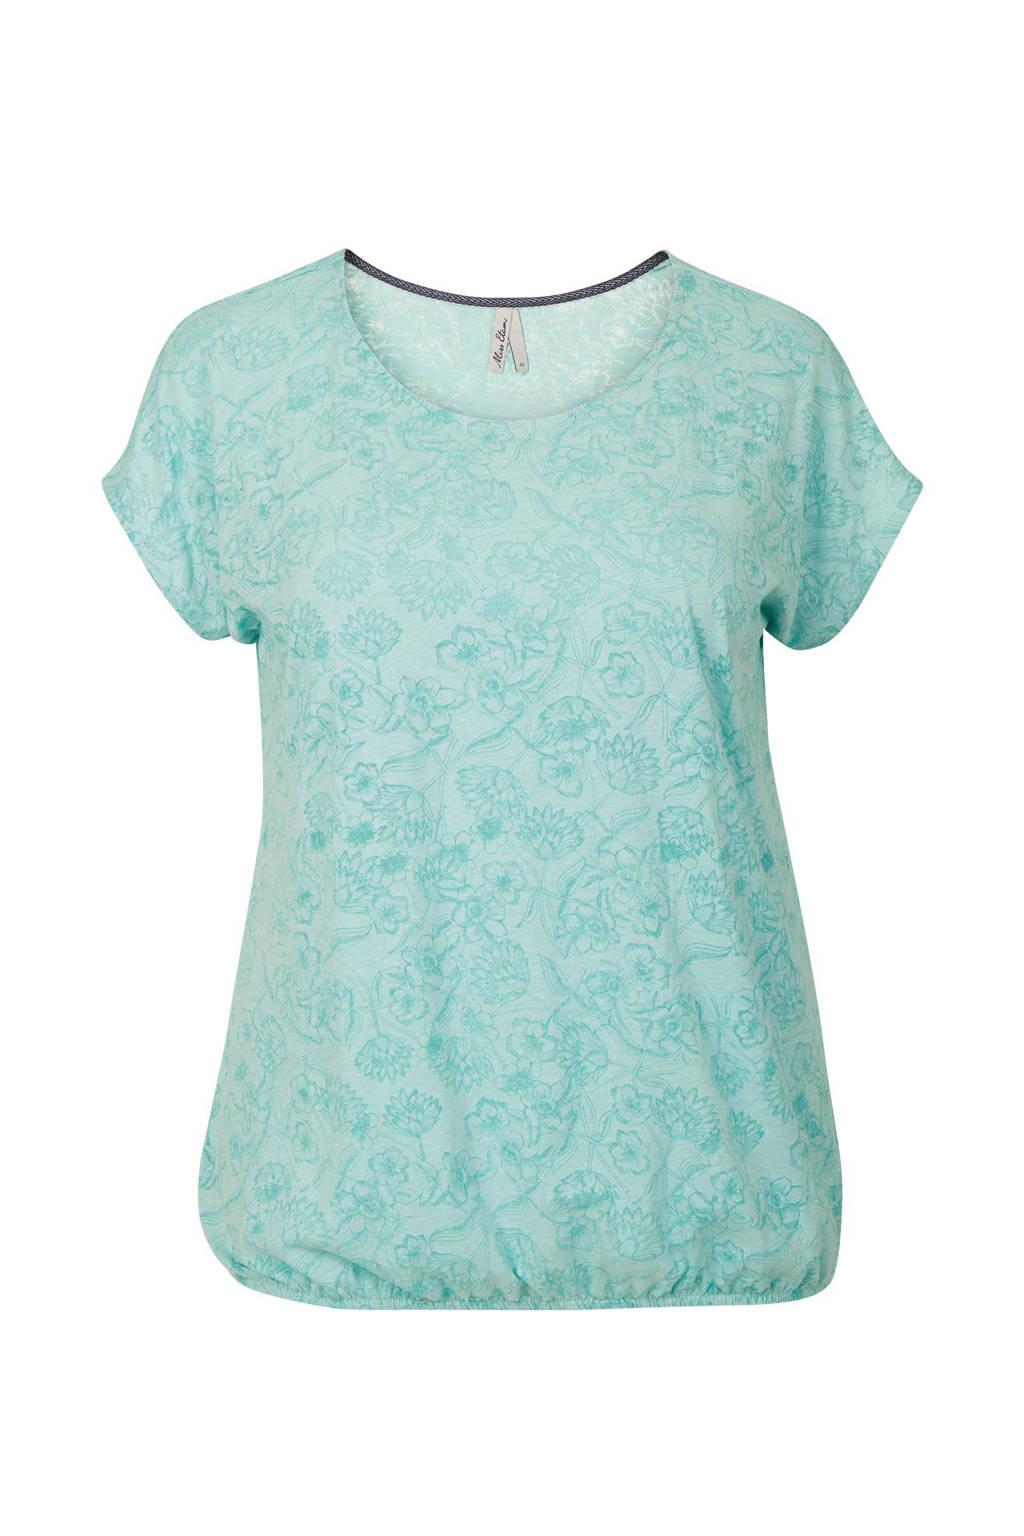 Miss Etam Plus T-shirt met all-over print mintgroen, Mintgroen